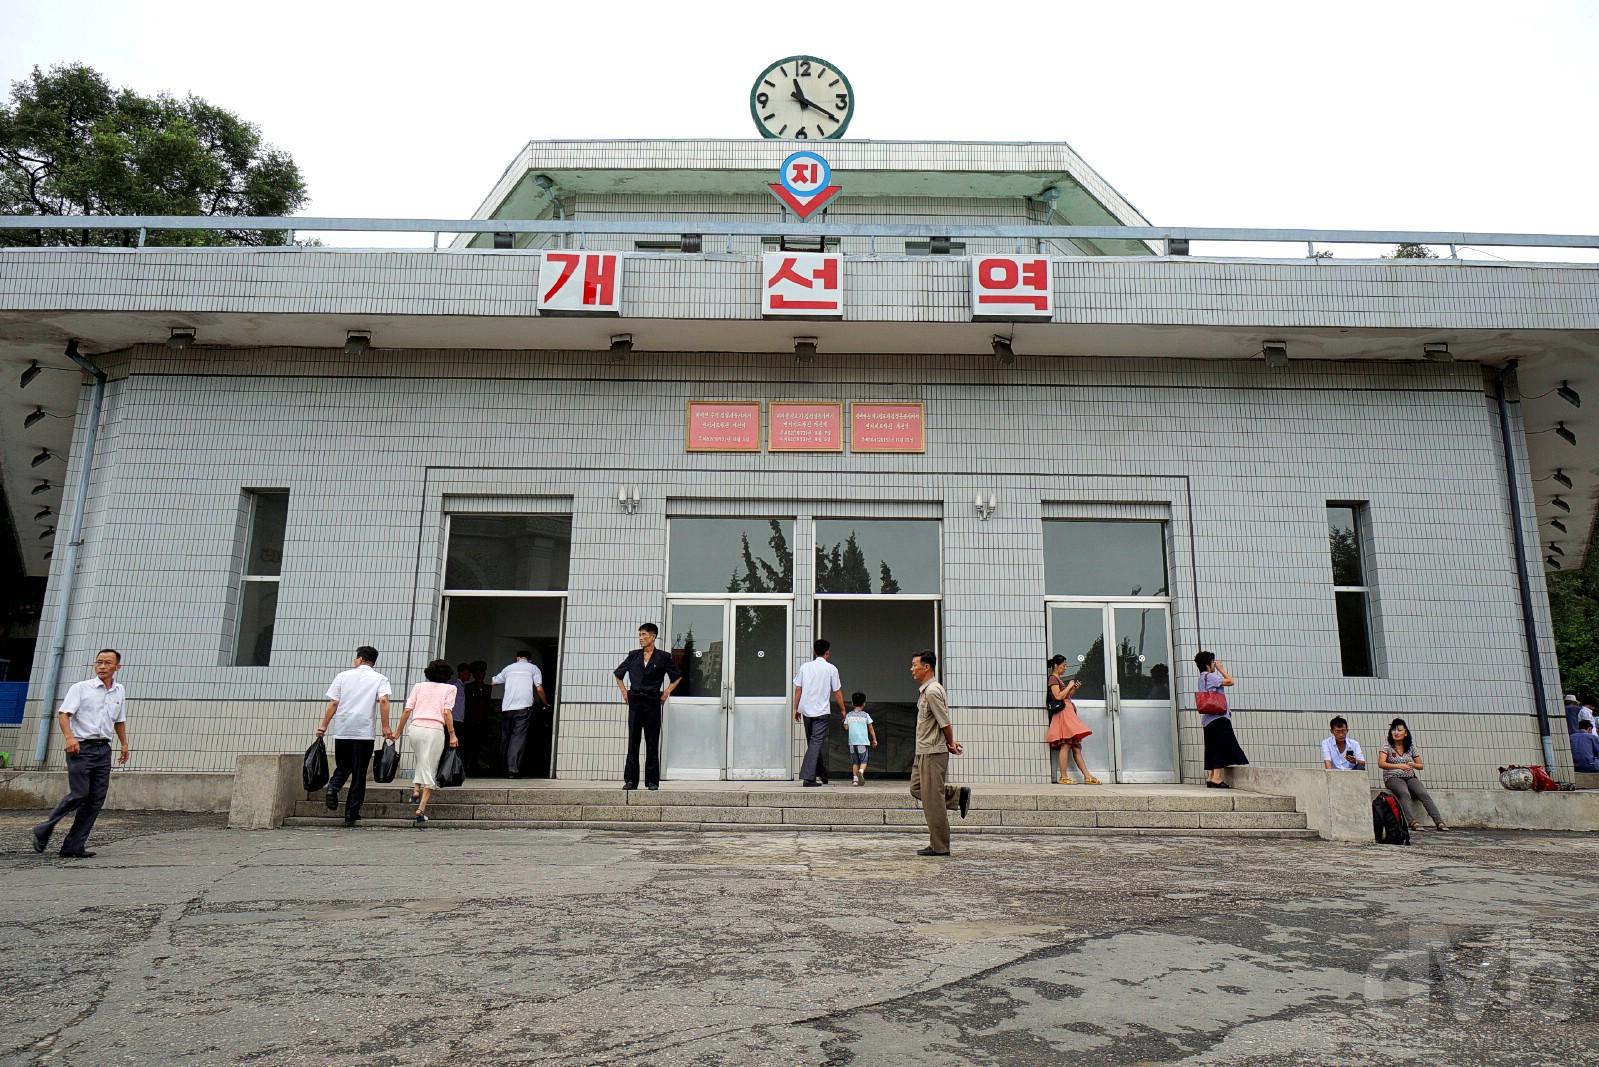 Kaeson Metro Station, Pyongyang, North Korea. August 15, 2017.